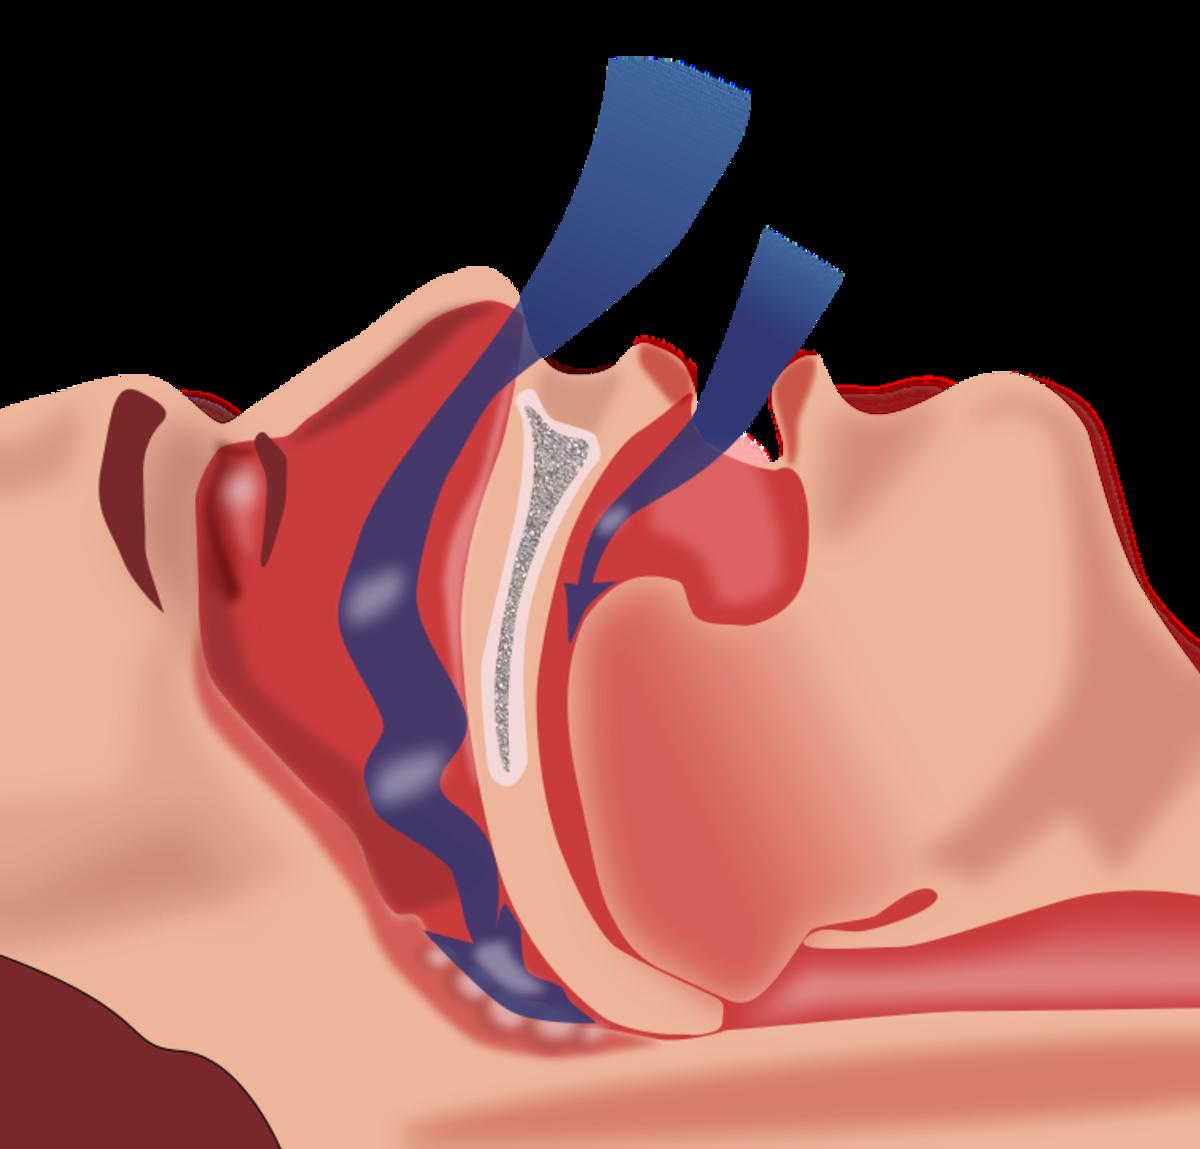 Sleep Apnea: Do You Have It? Causes, Symptoms, and Diagnosis